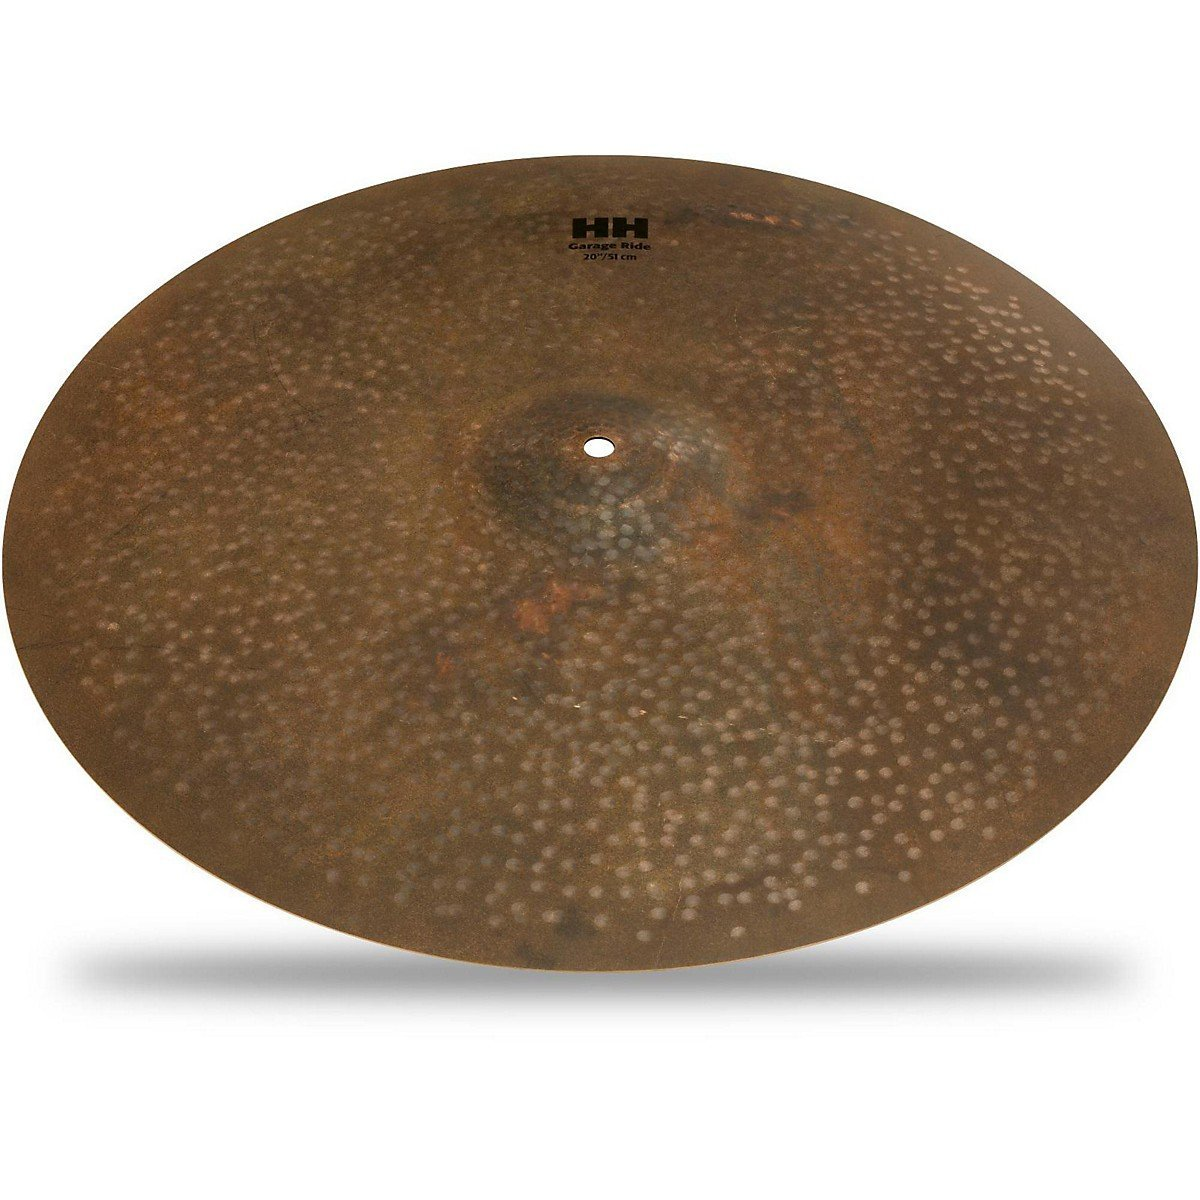 "Sabian 120102 HH Remastered 20"" Garage Ride Cymbal by Sabian"